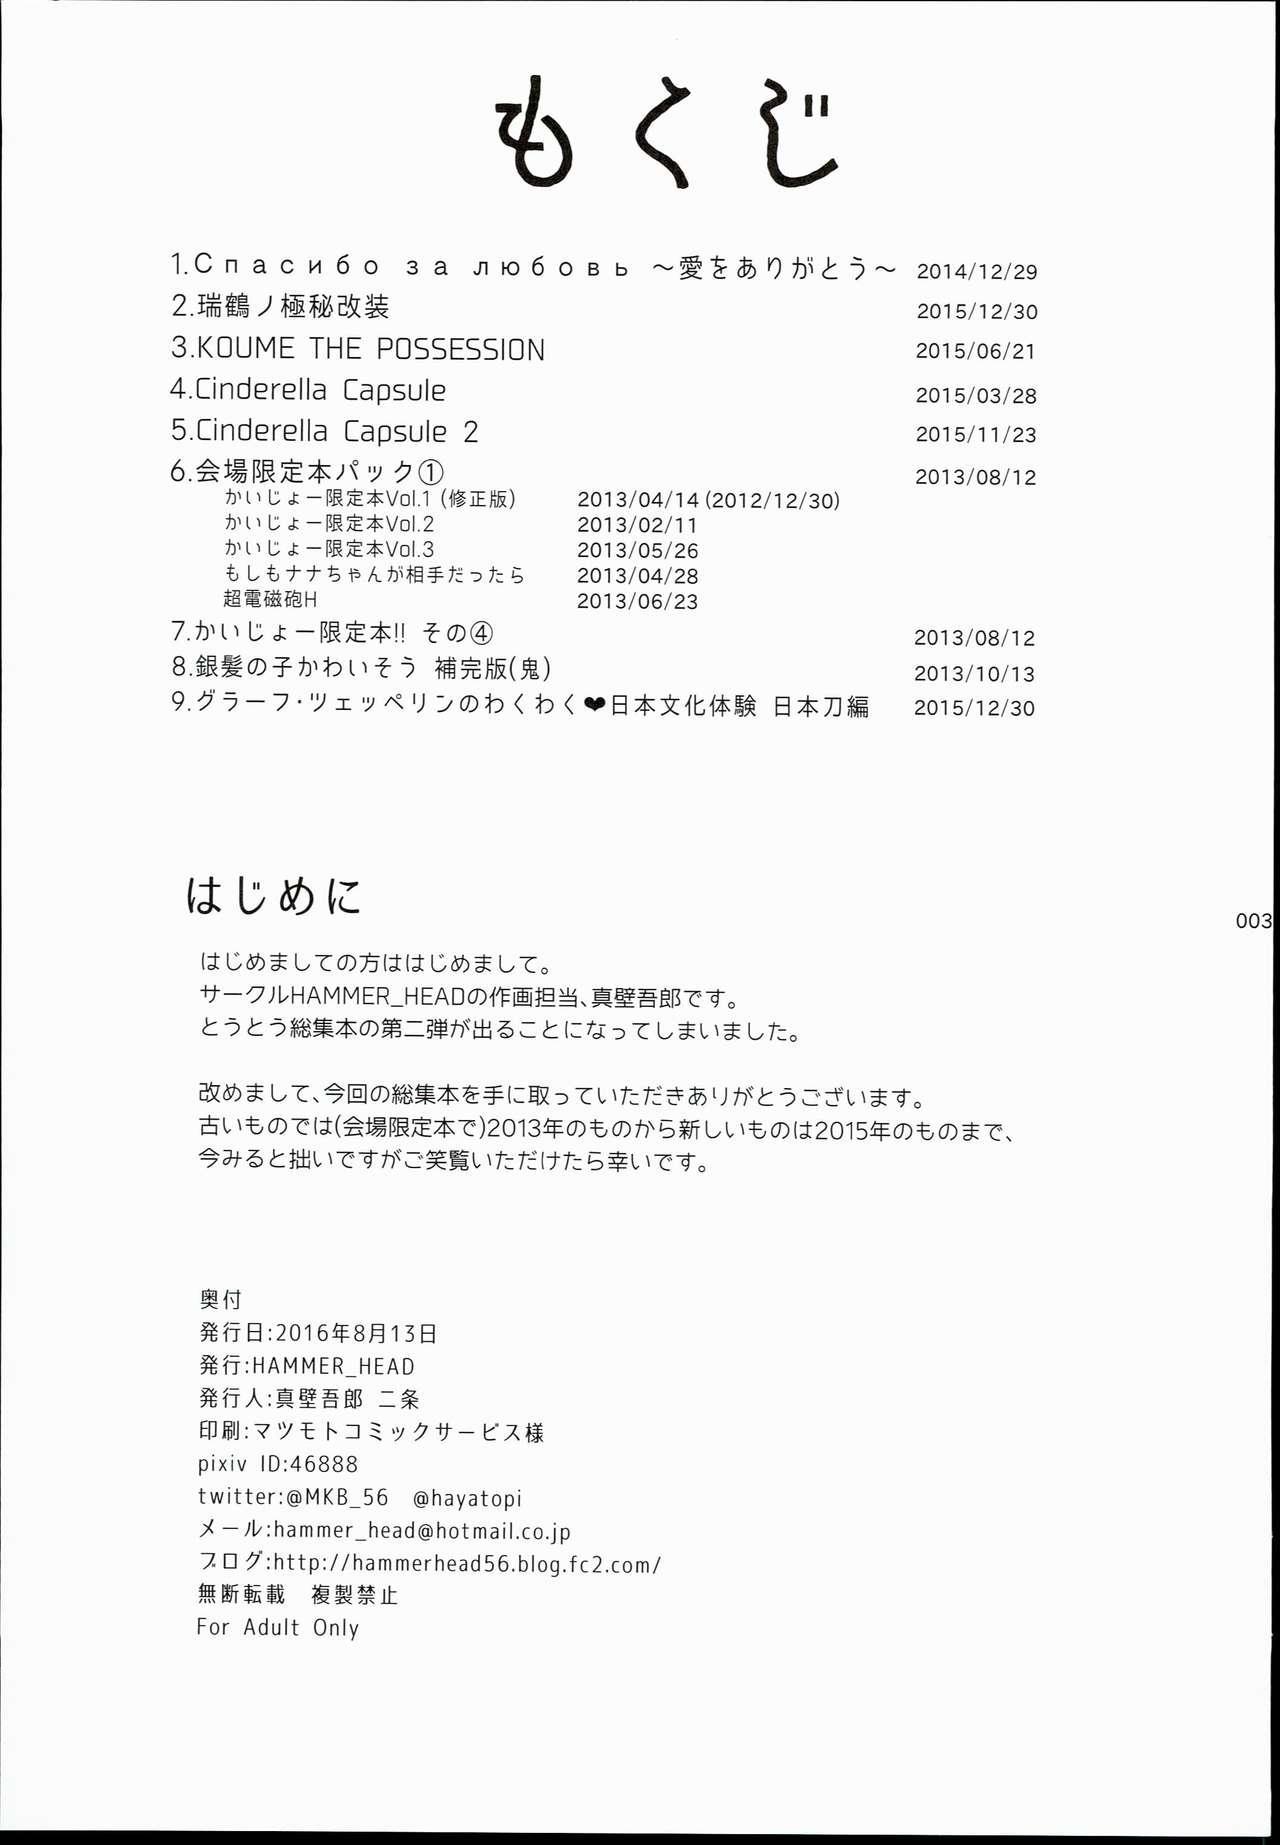 2014~2015 HAMMER_HEAD Soushuubon +  Kaijou Genteibon Shuroku 2